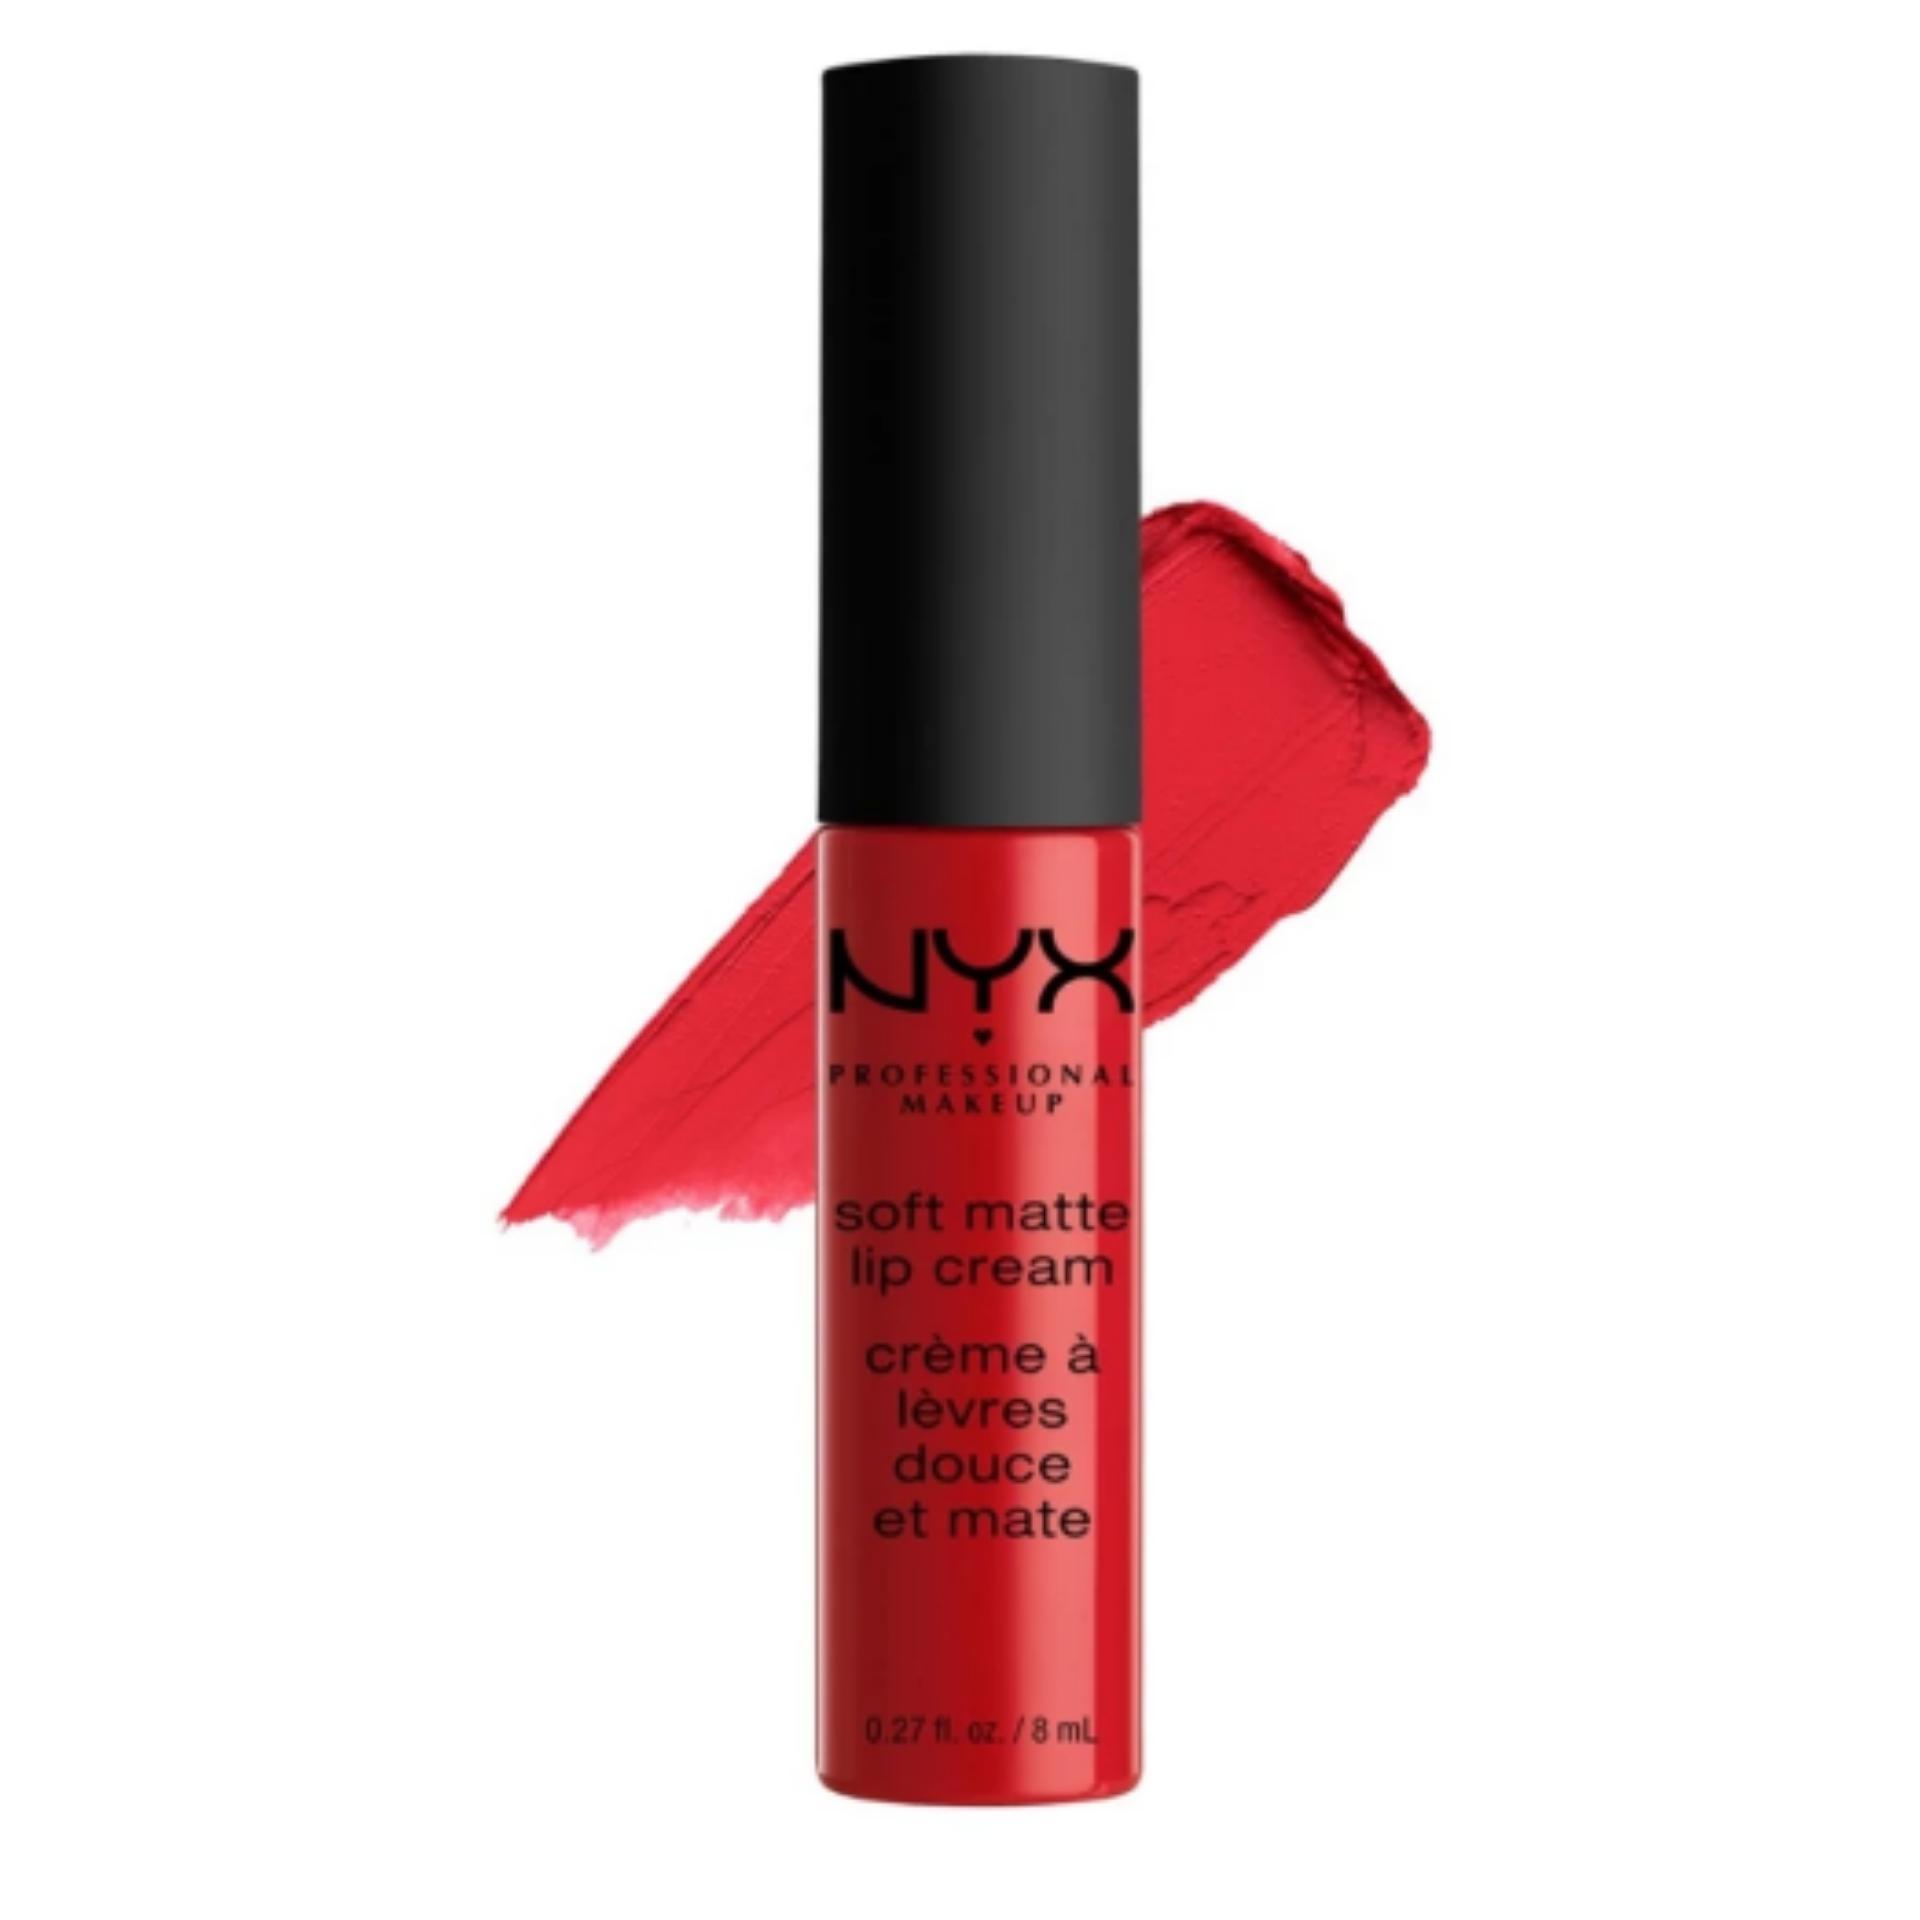 NYX Professional Makeup Soft Matte Lip Cream 01 Amsterdam - Lipstik Matte Merah Long Lasting Lightweight Tahan Lama